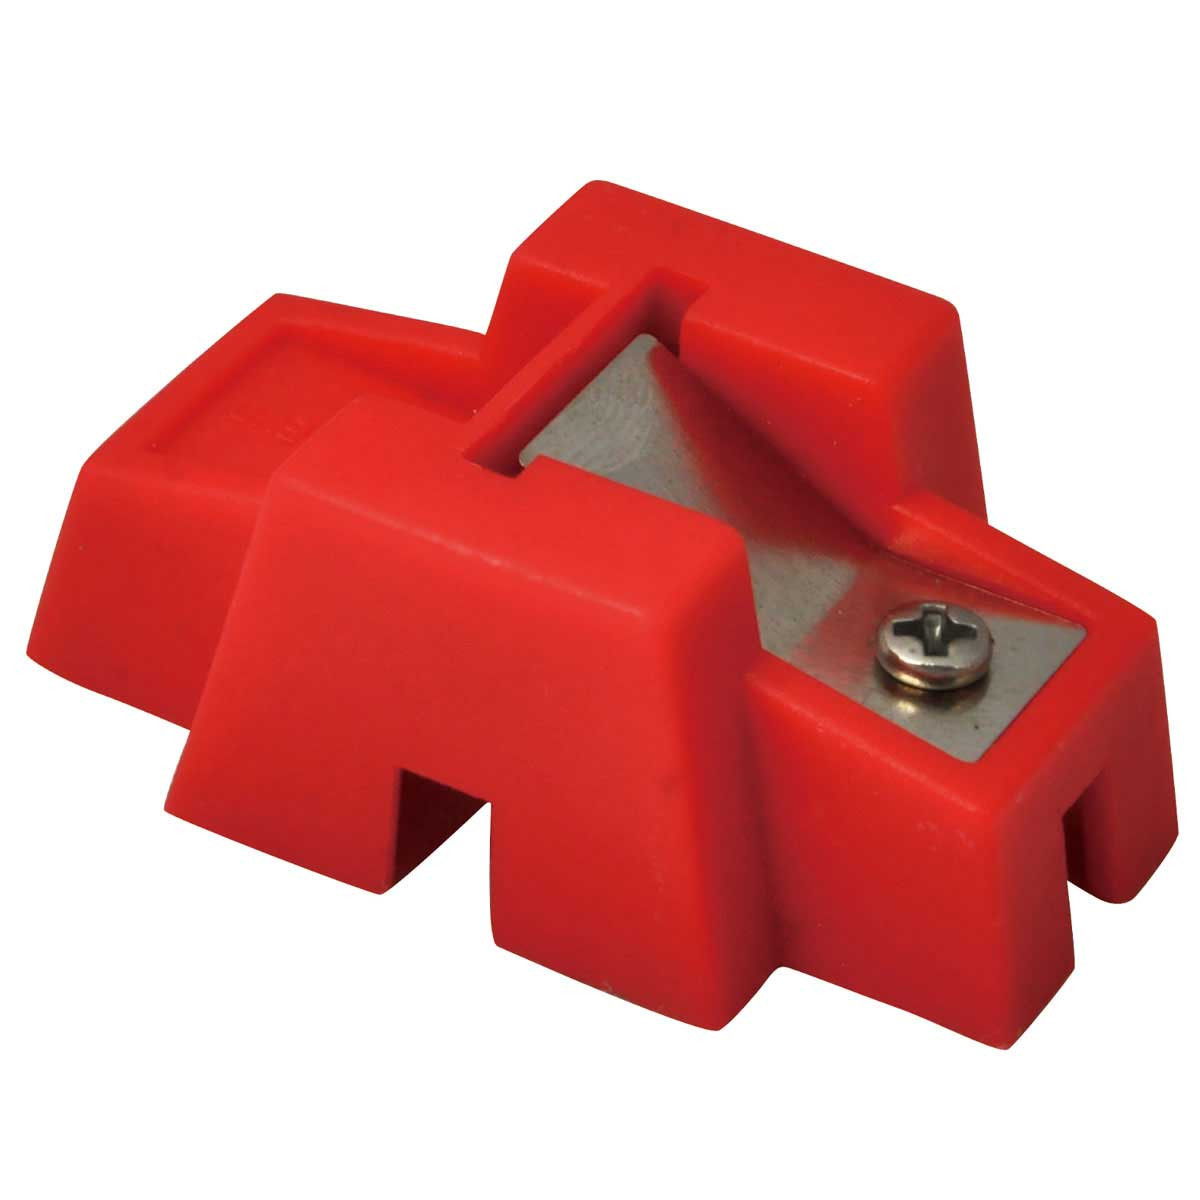 DTA Leveling Kit lippage cap